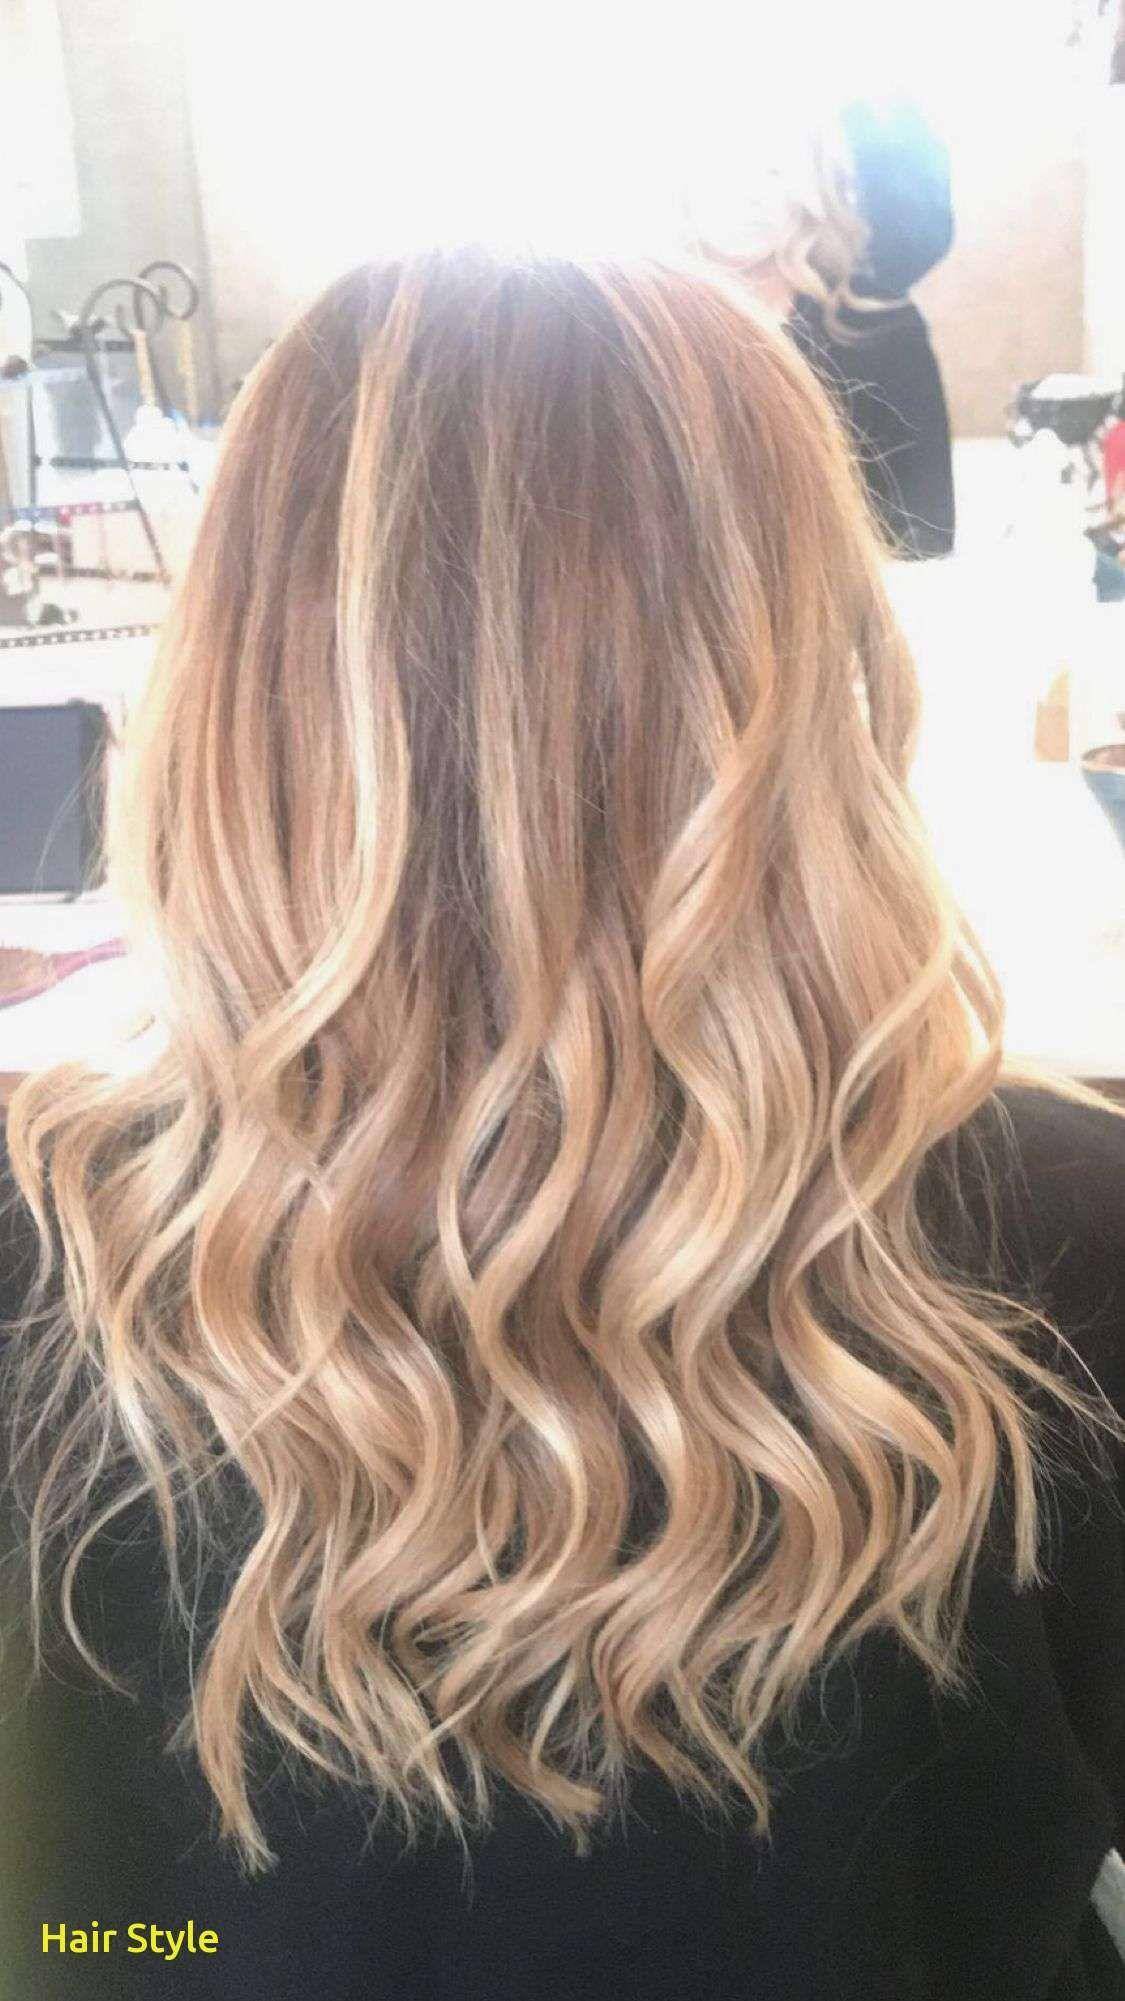 Frische Haarfarbe Trends Balayage Haarfarben Fettige